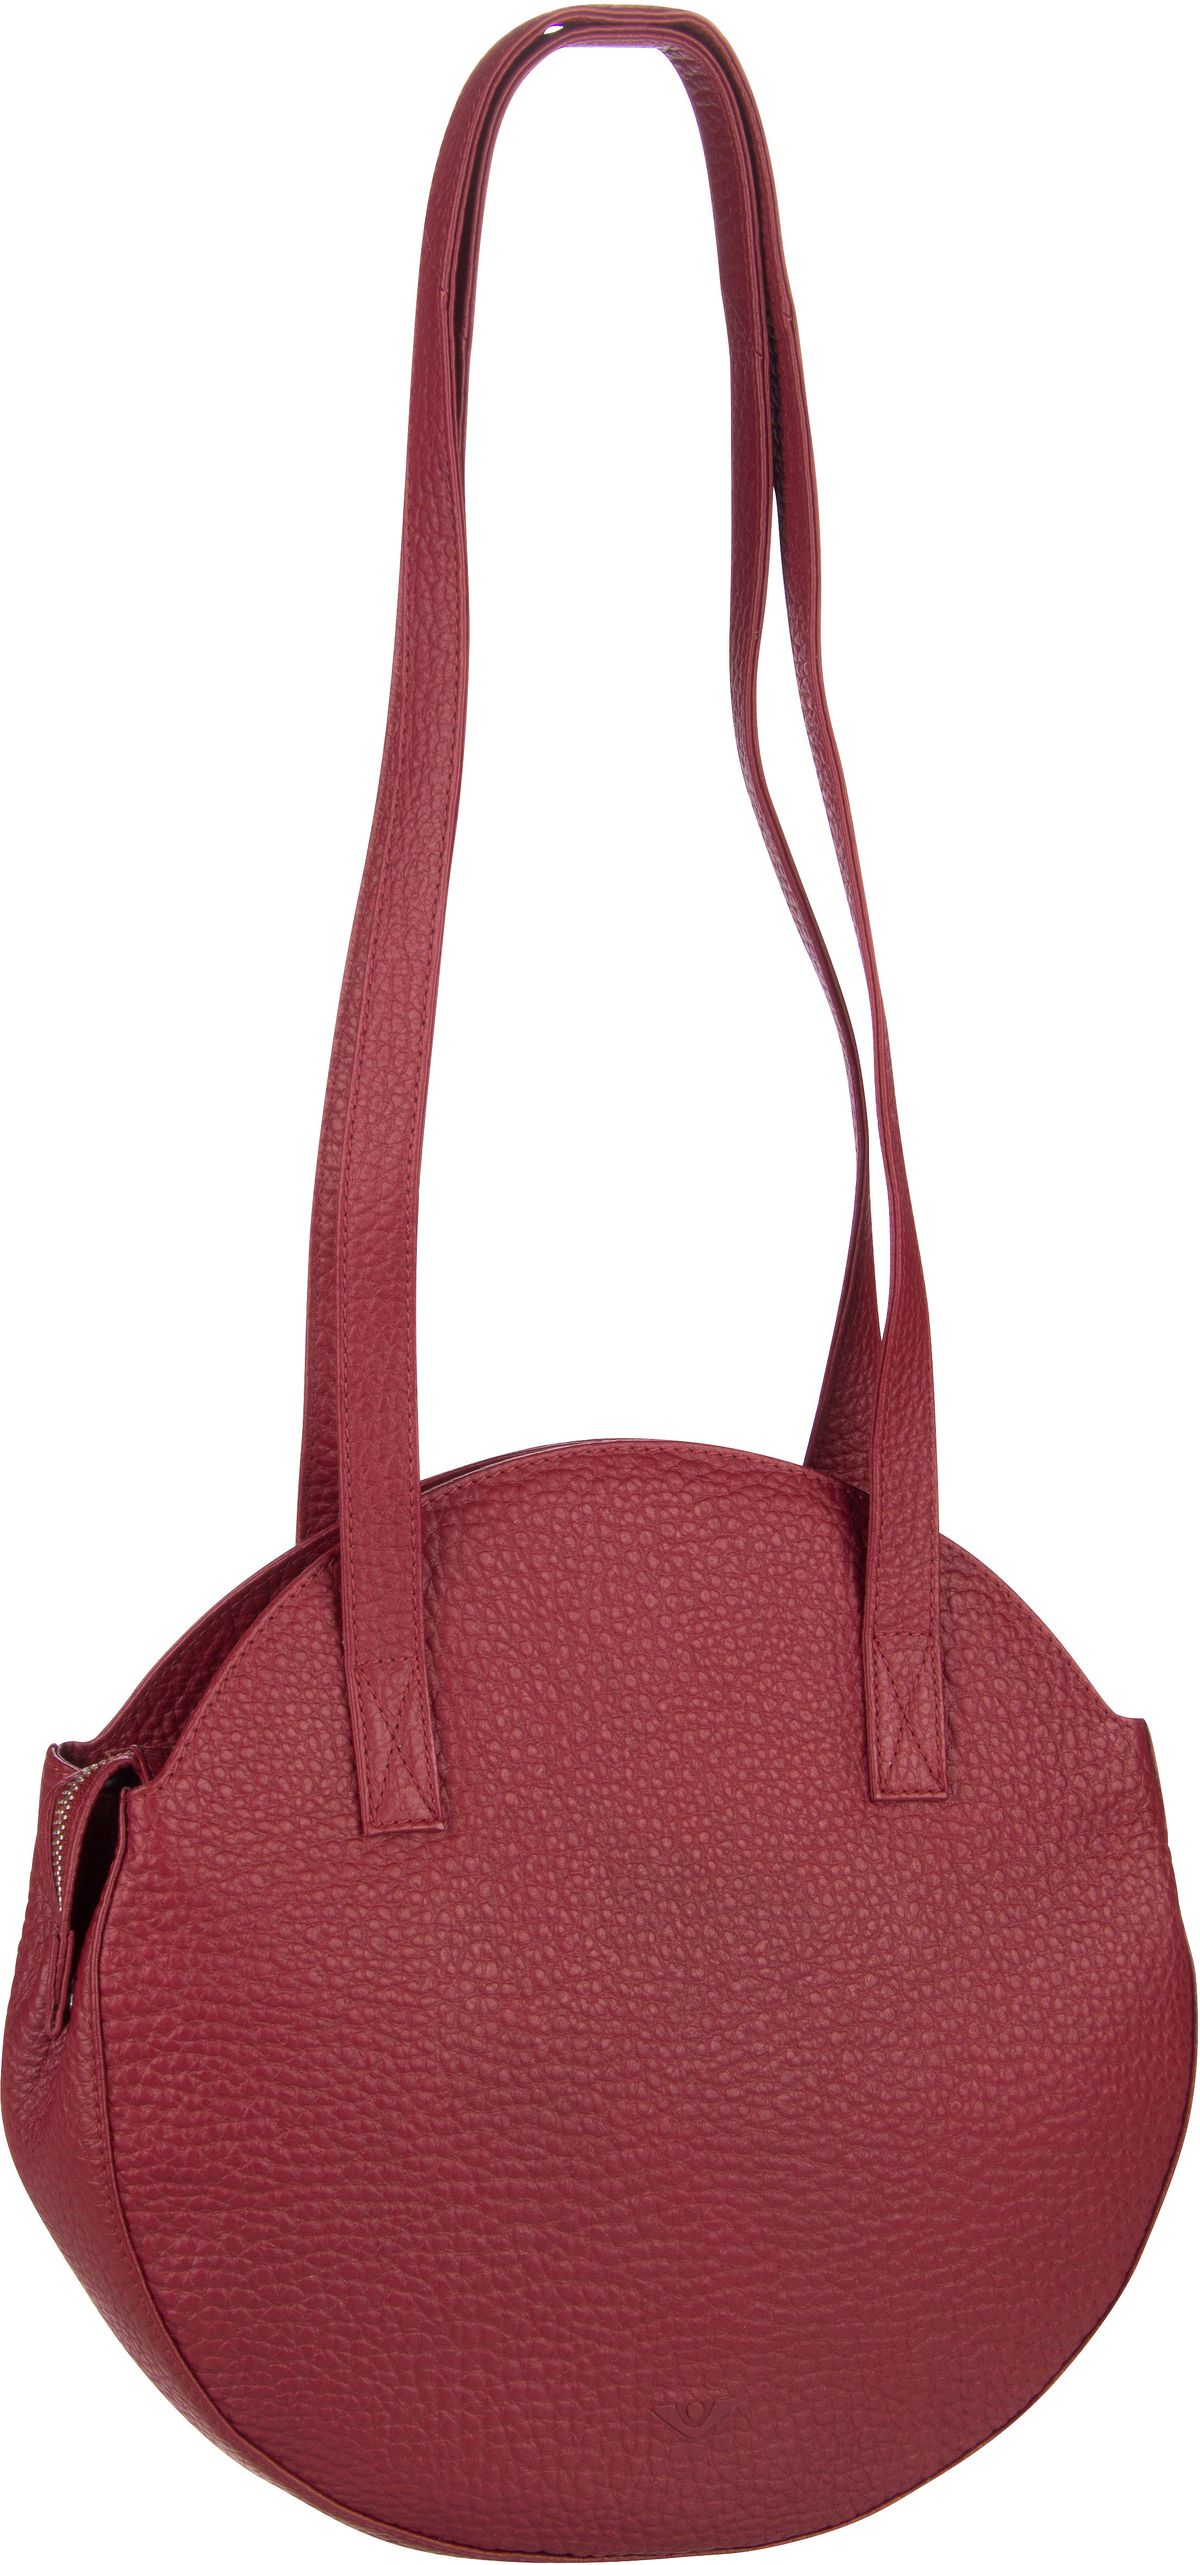 Voi Handtasche Hirsch 21954 Hobo Bag Granat